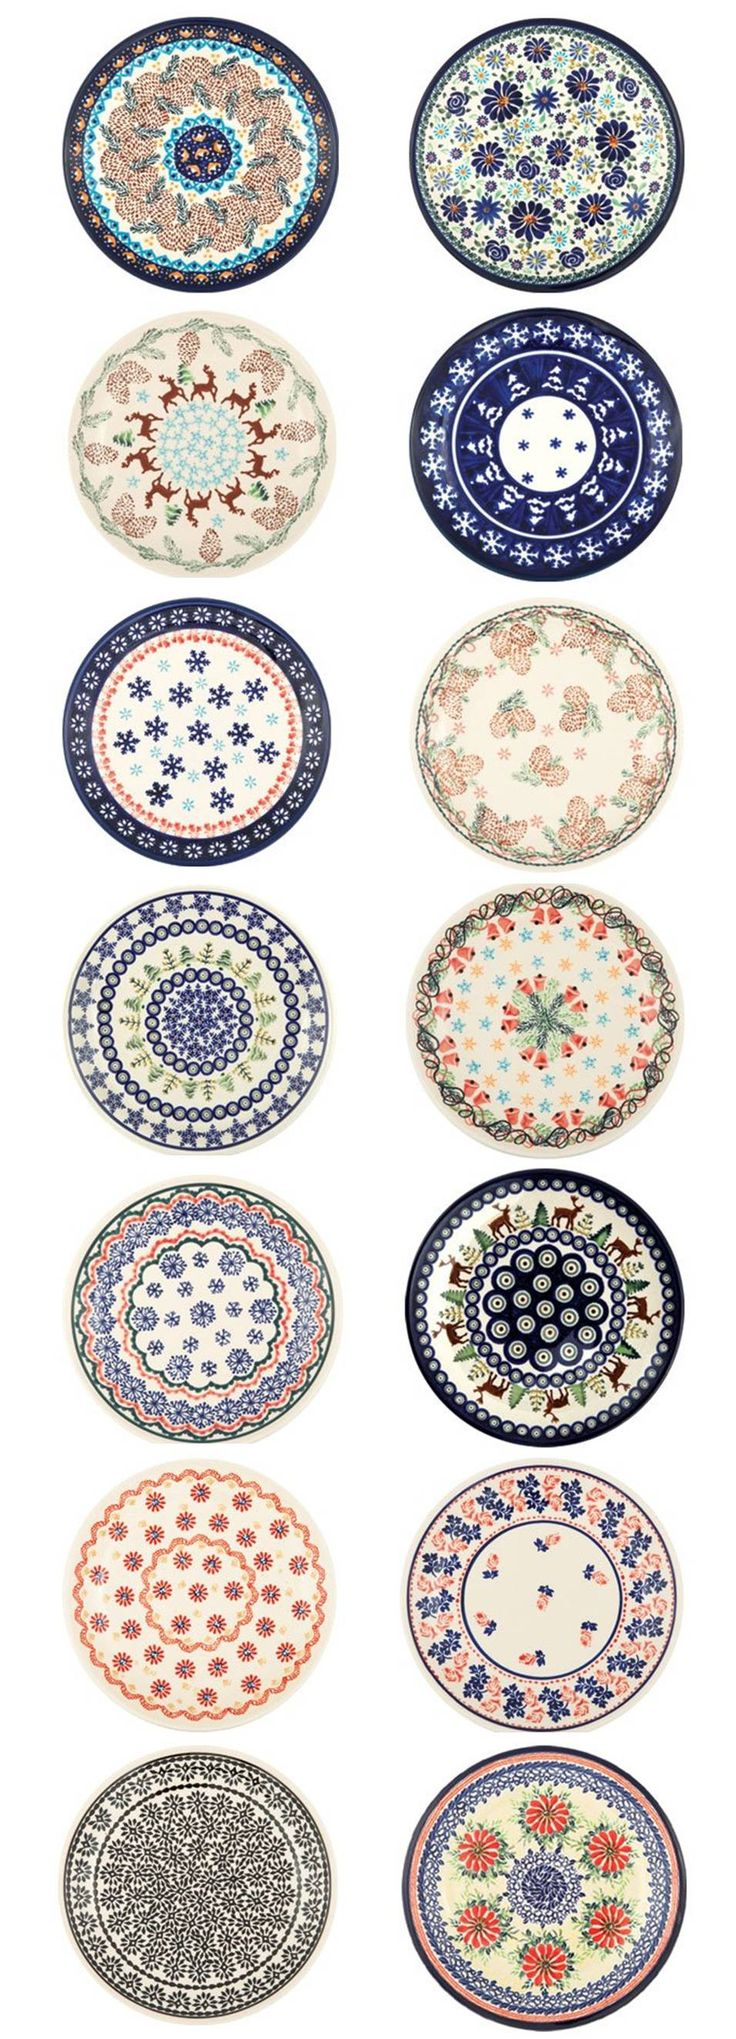 97 best china plates images on Pinterest | Blue dishes, Blue china ...